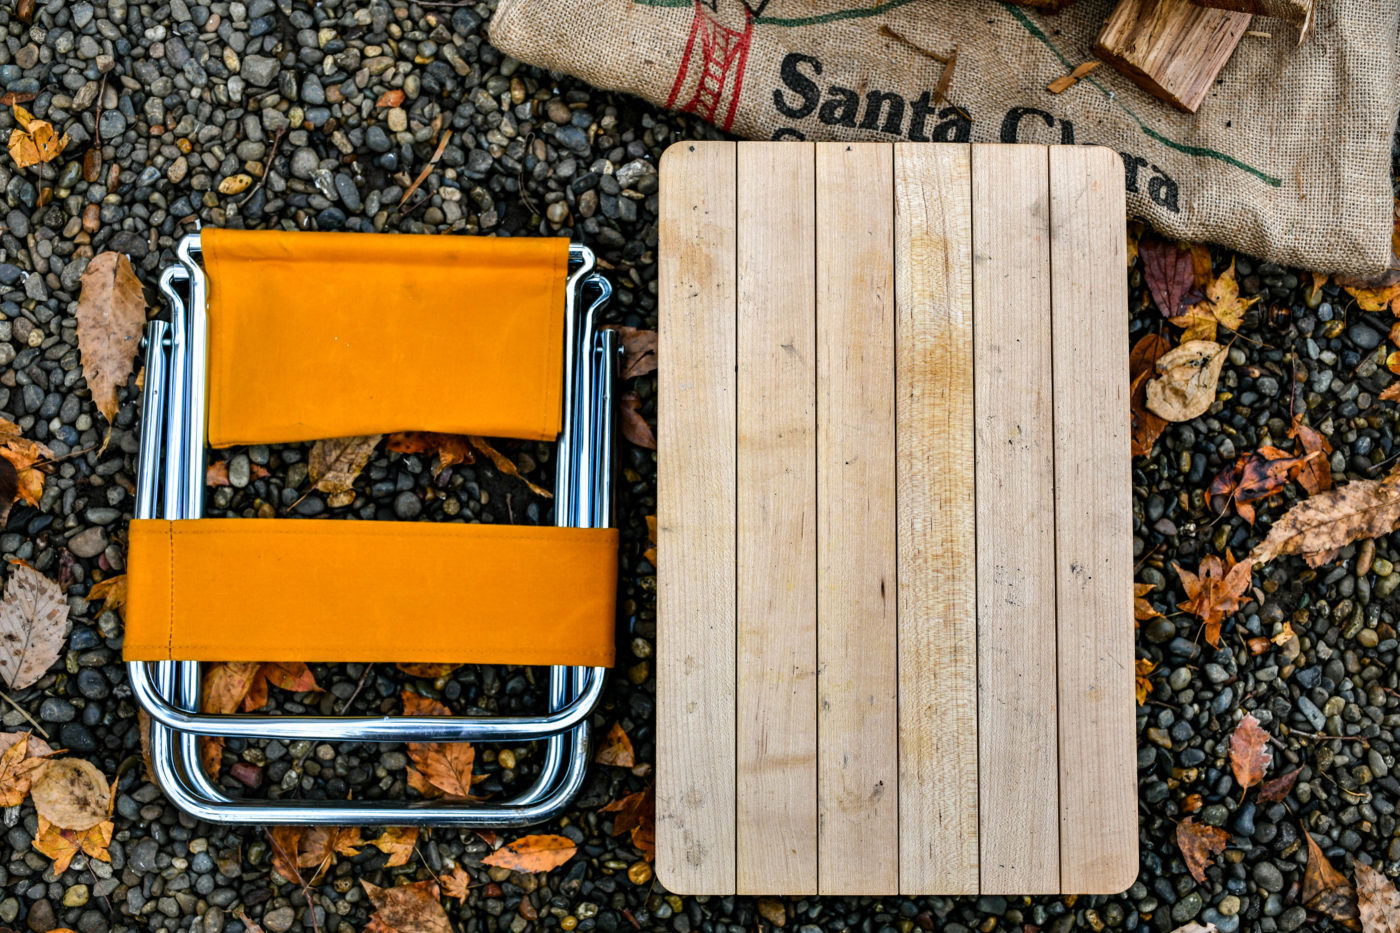 DAISピクニックチェアククチェアのキャンプ道具レビュー